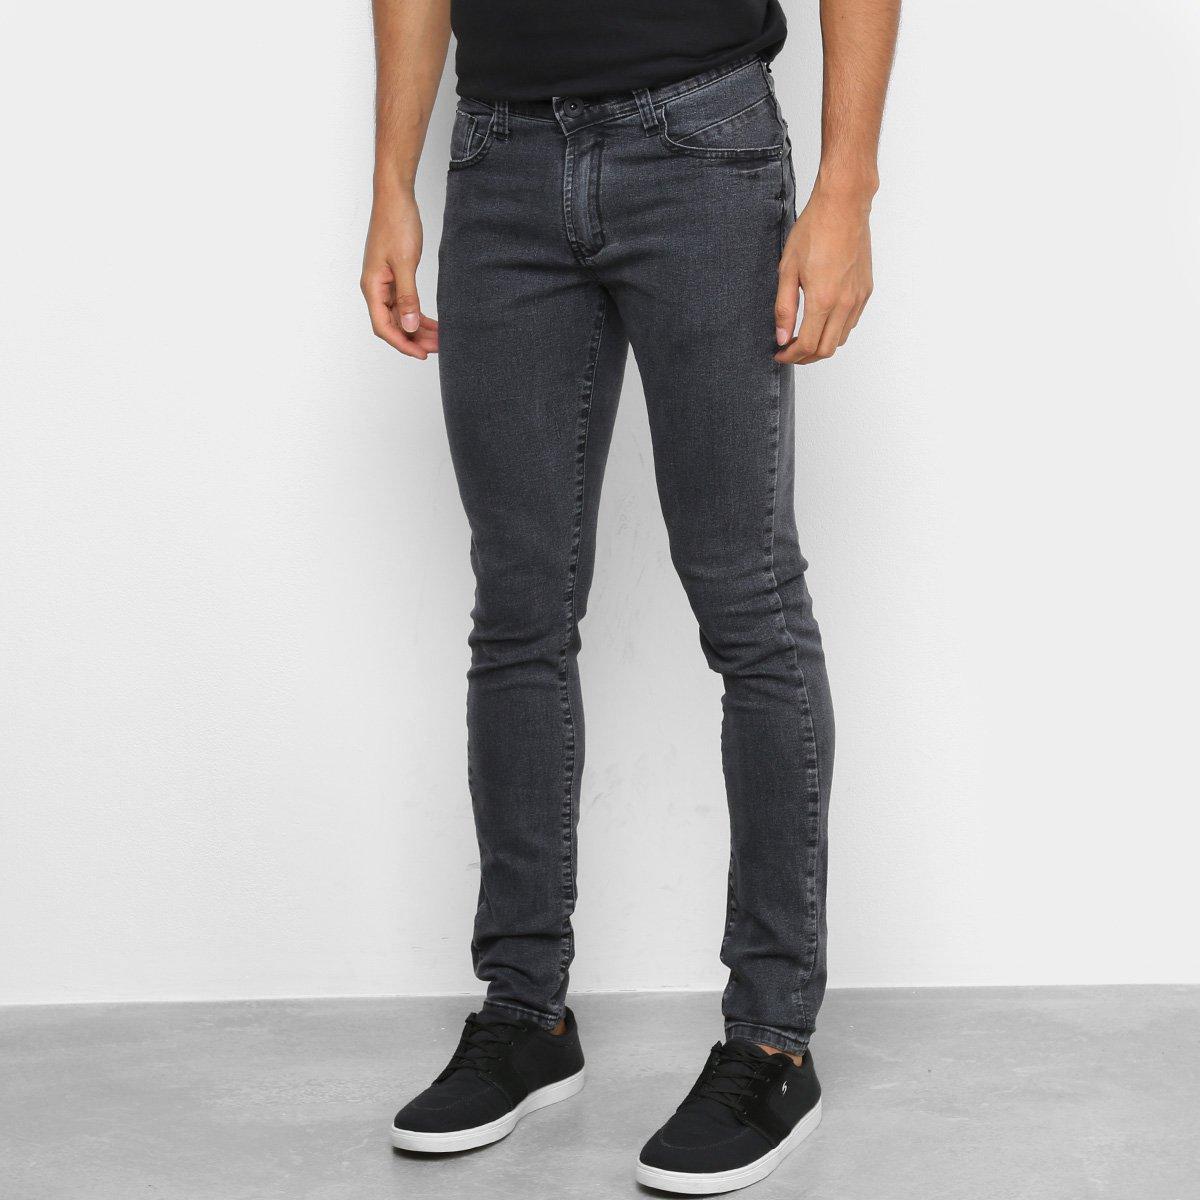 Calça Jeans HD LY Masculina